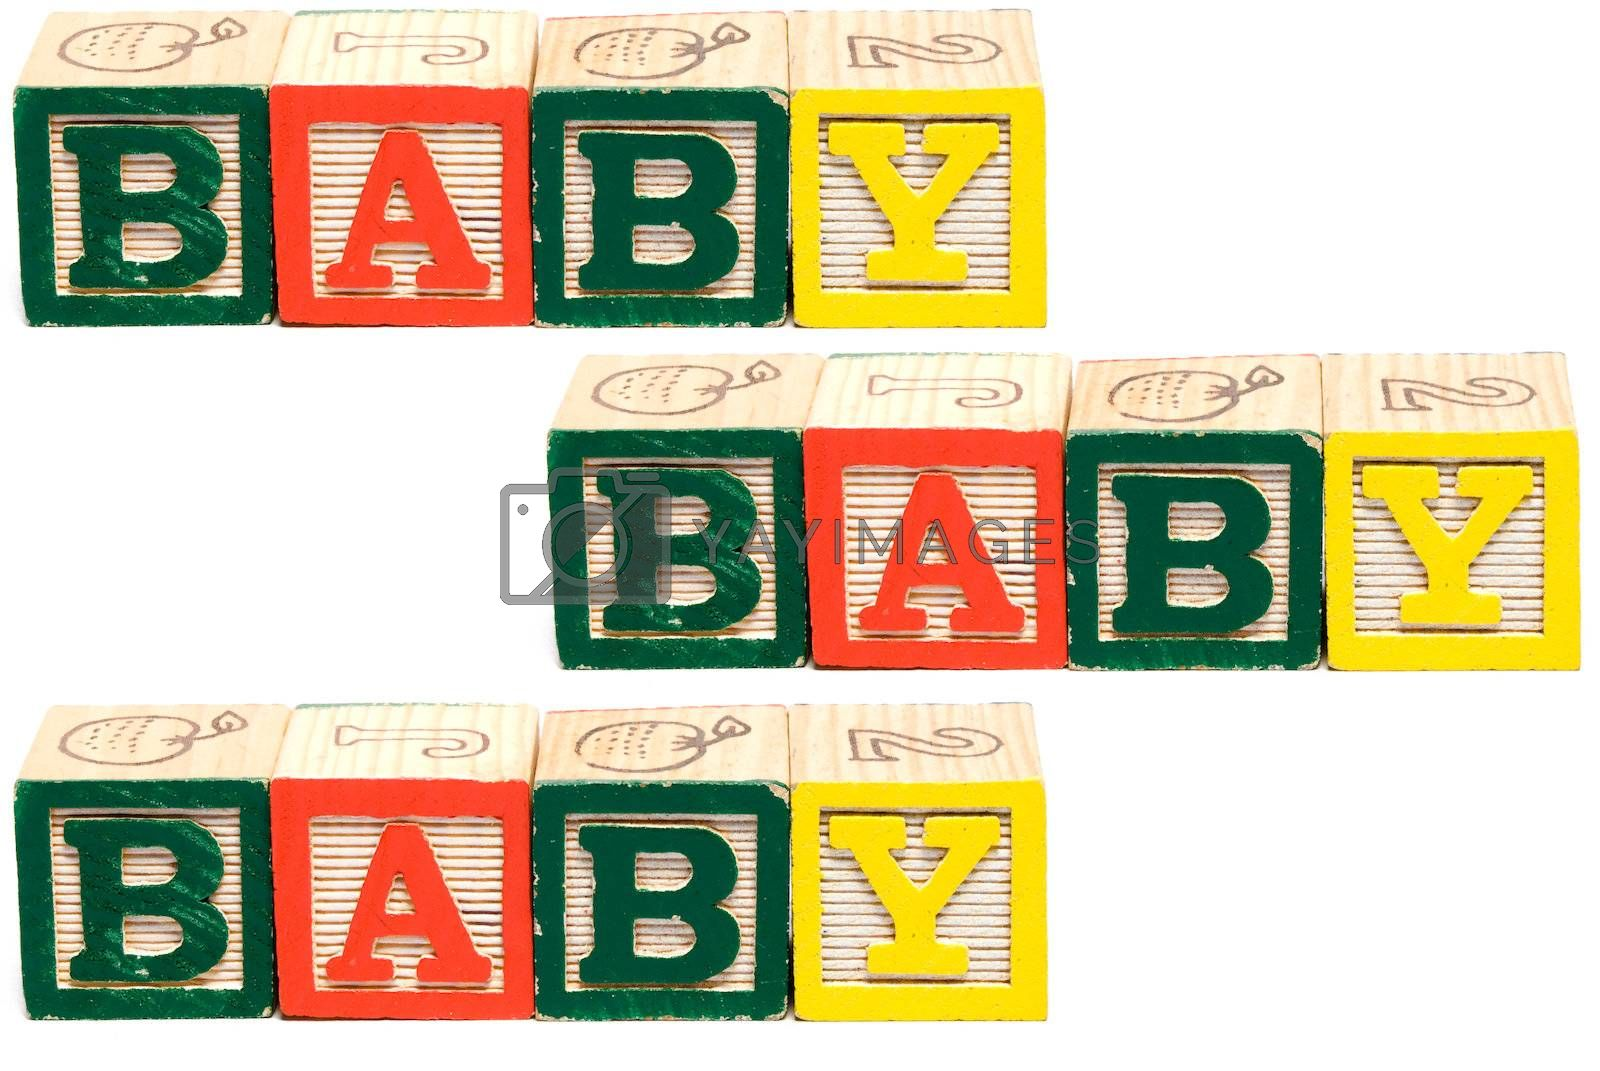 Three groups of baby blocks spelling the word baby